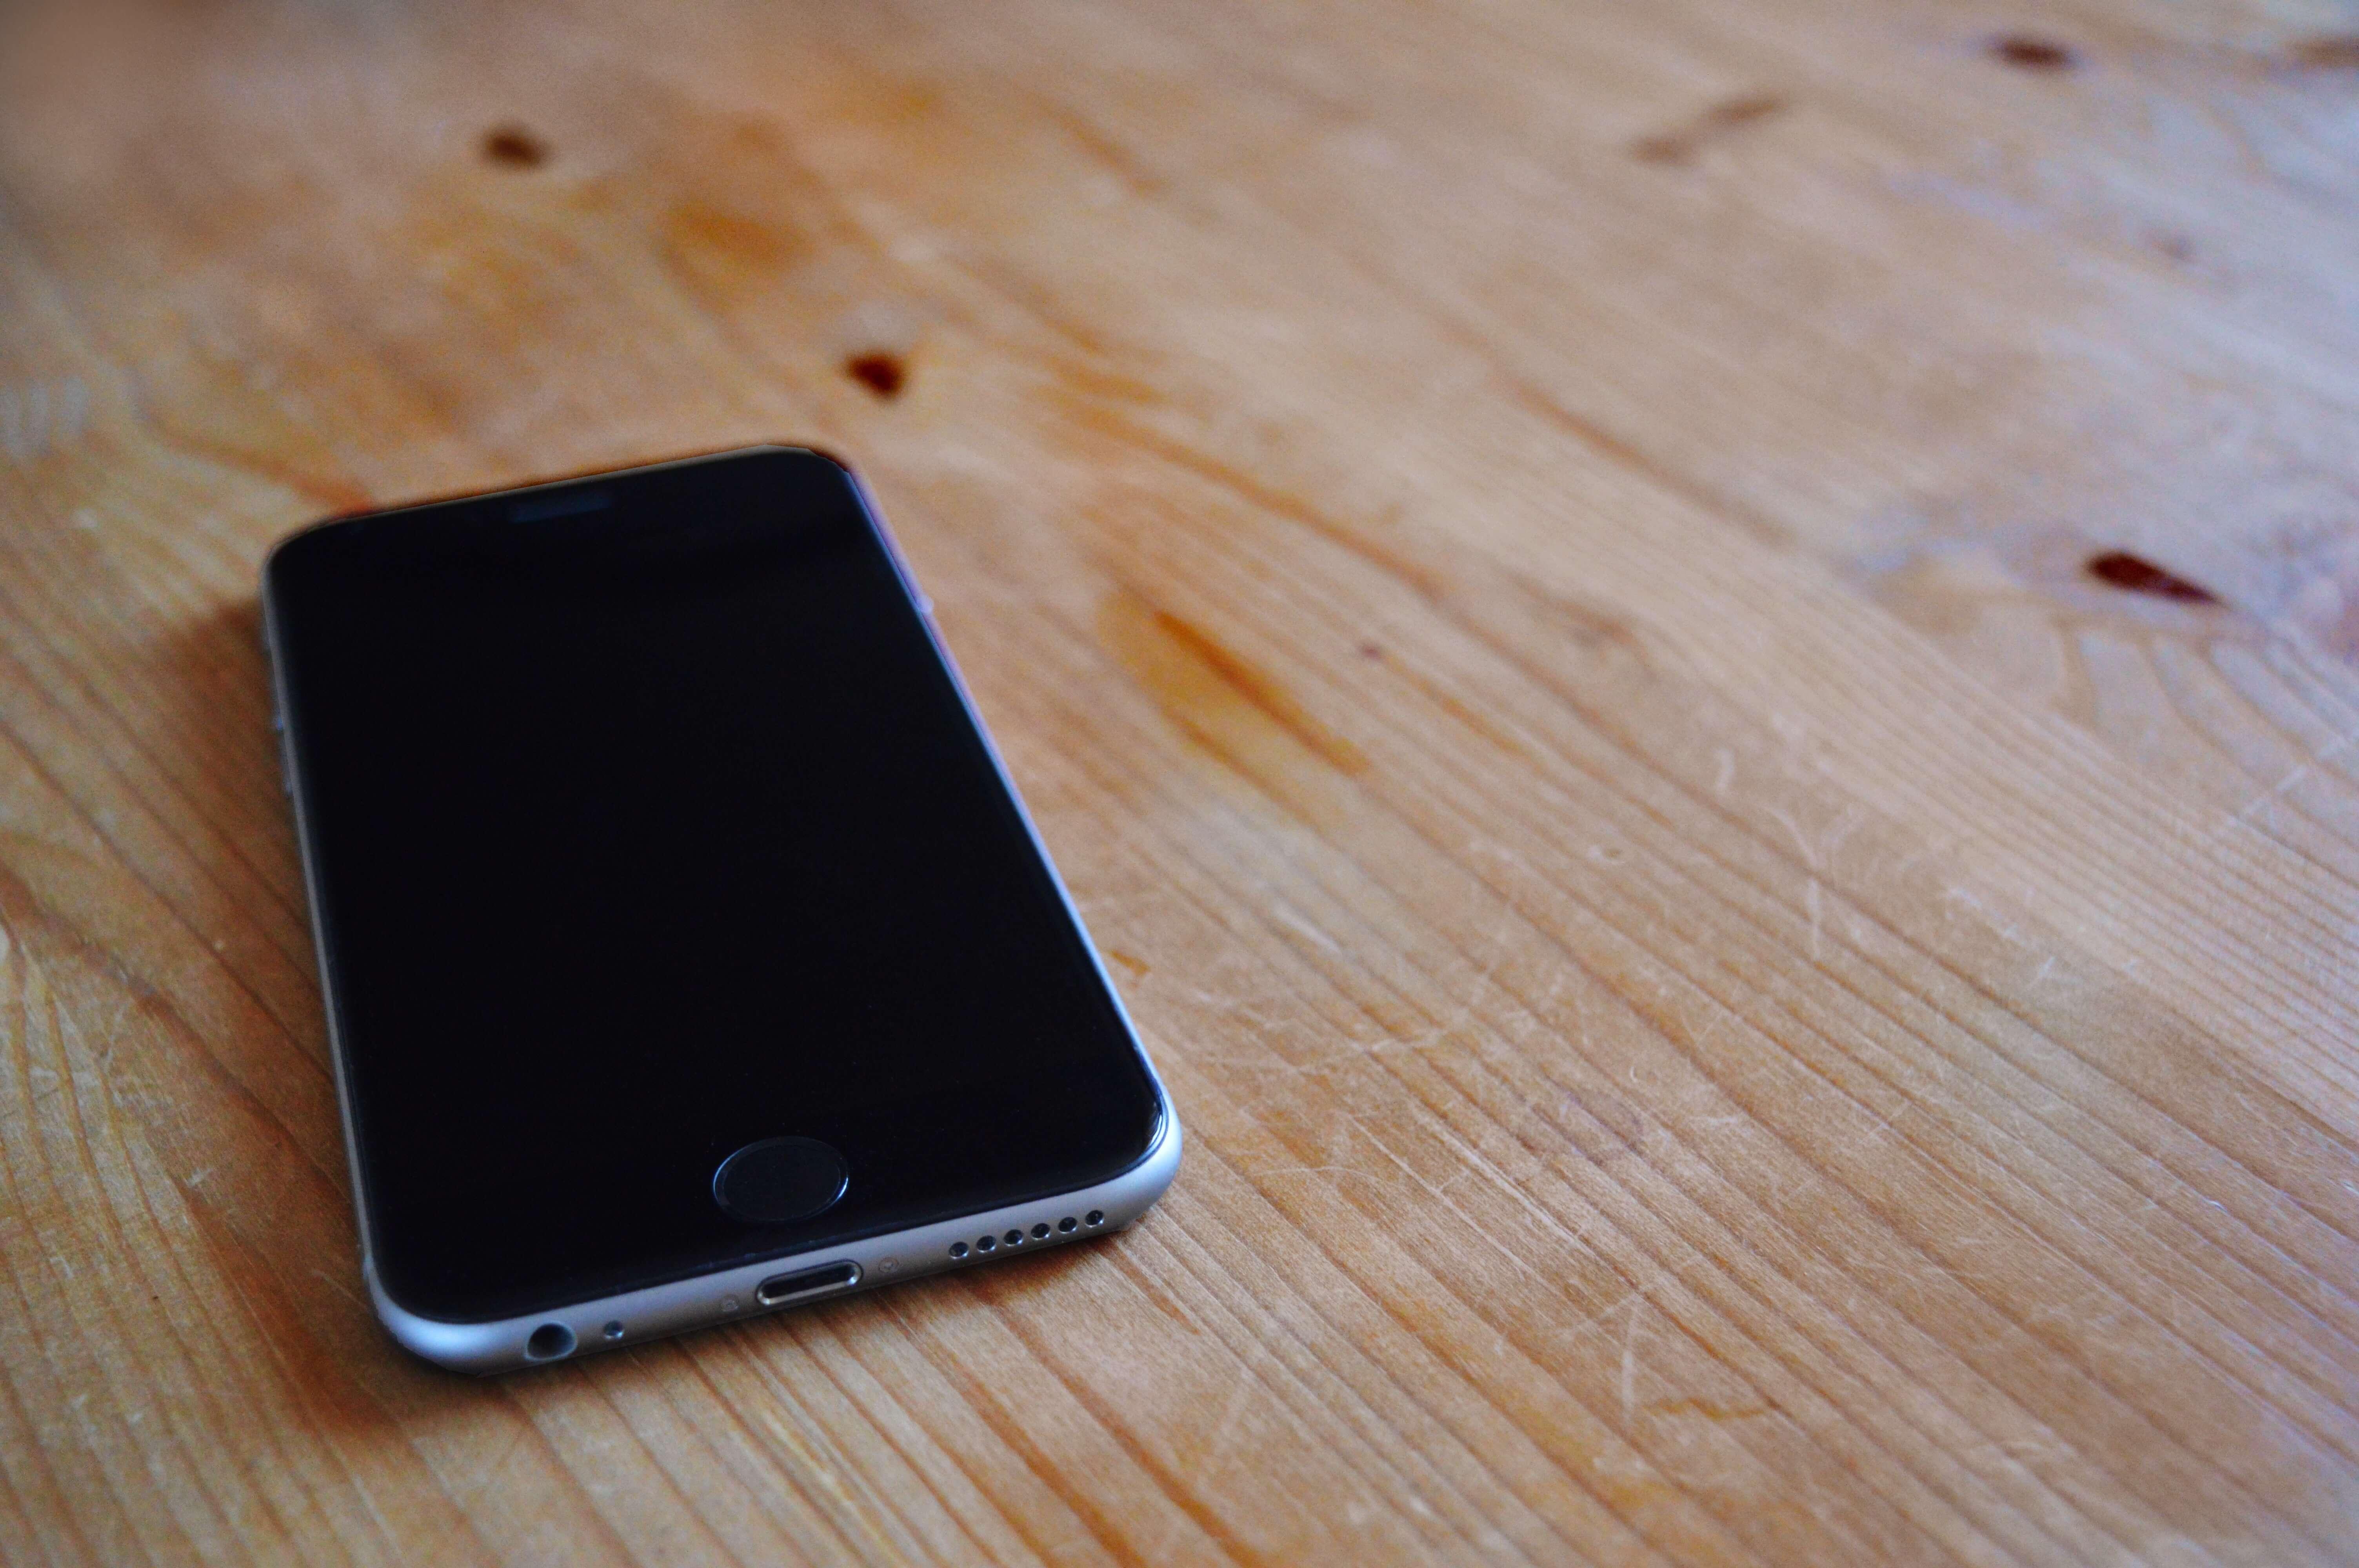 iPhone修理業者の選び方!公式修理に近い!?高品質ディスプレイ利用店